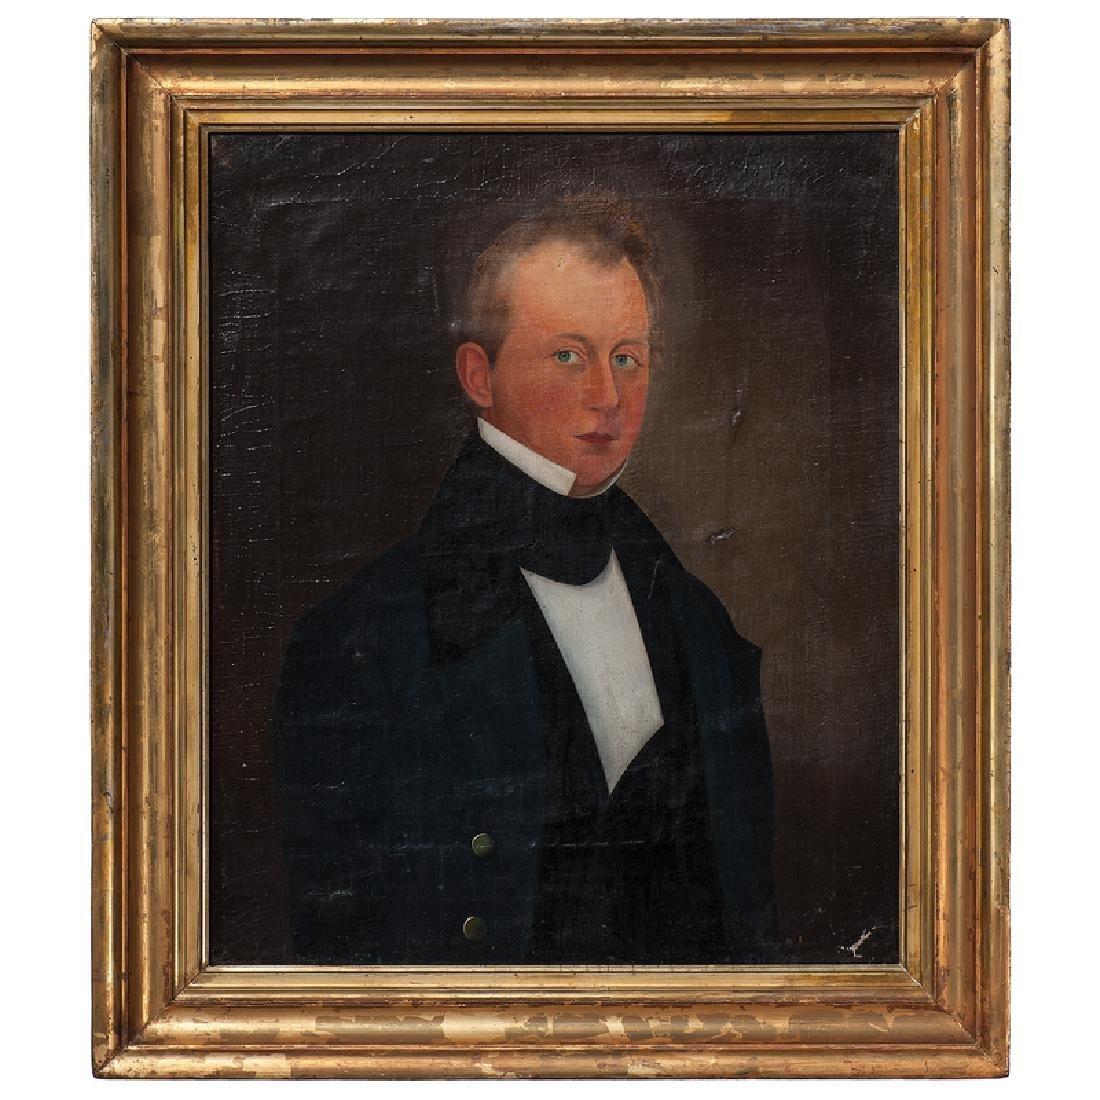 American Portrait of a Man